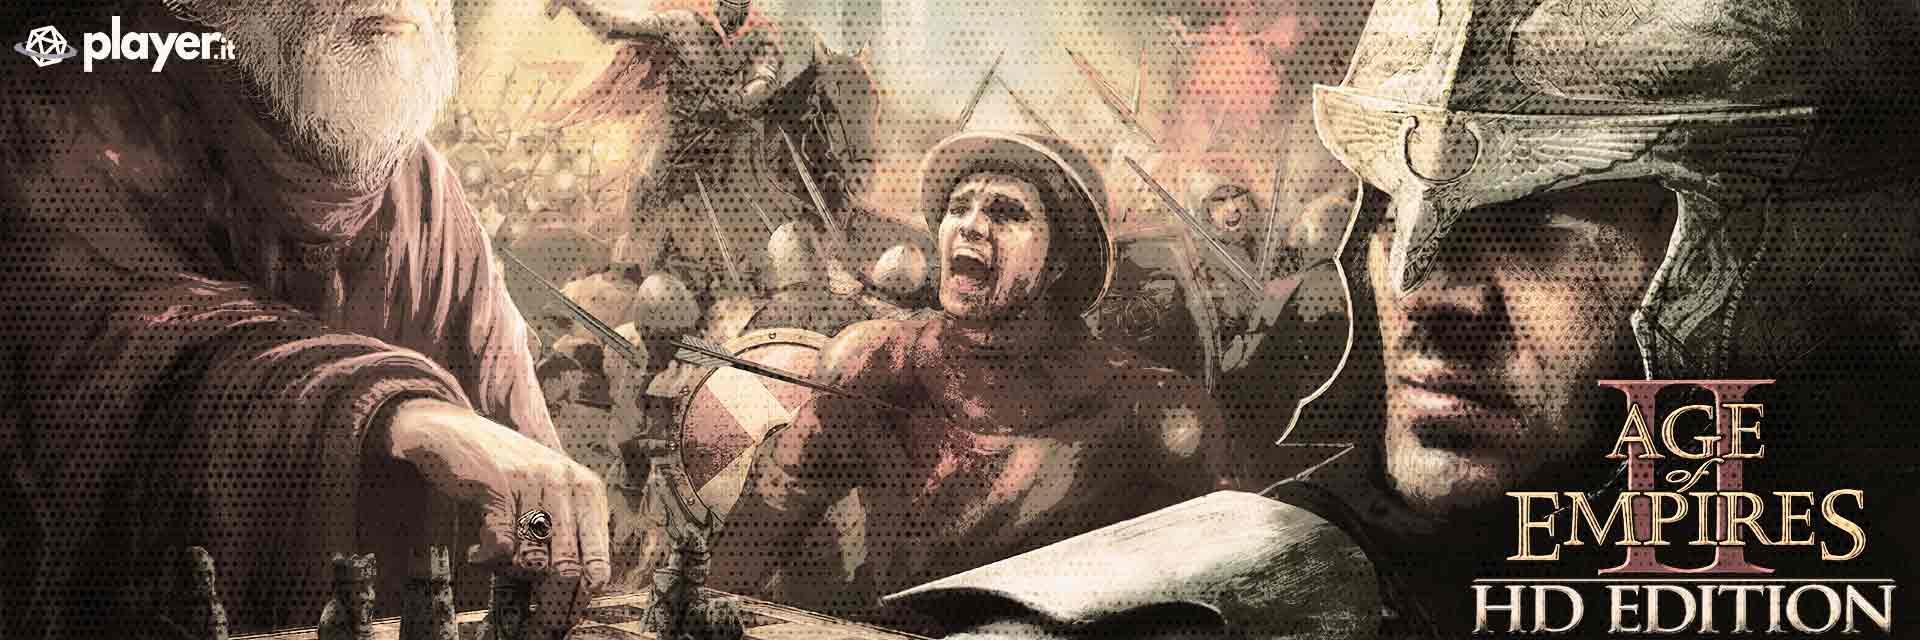 Age Of Empires II HD wallpaper